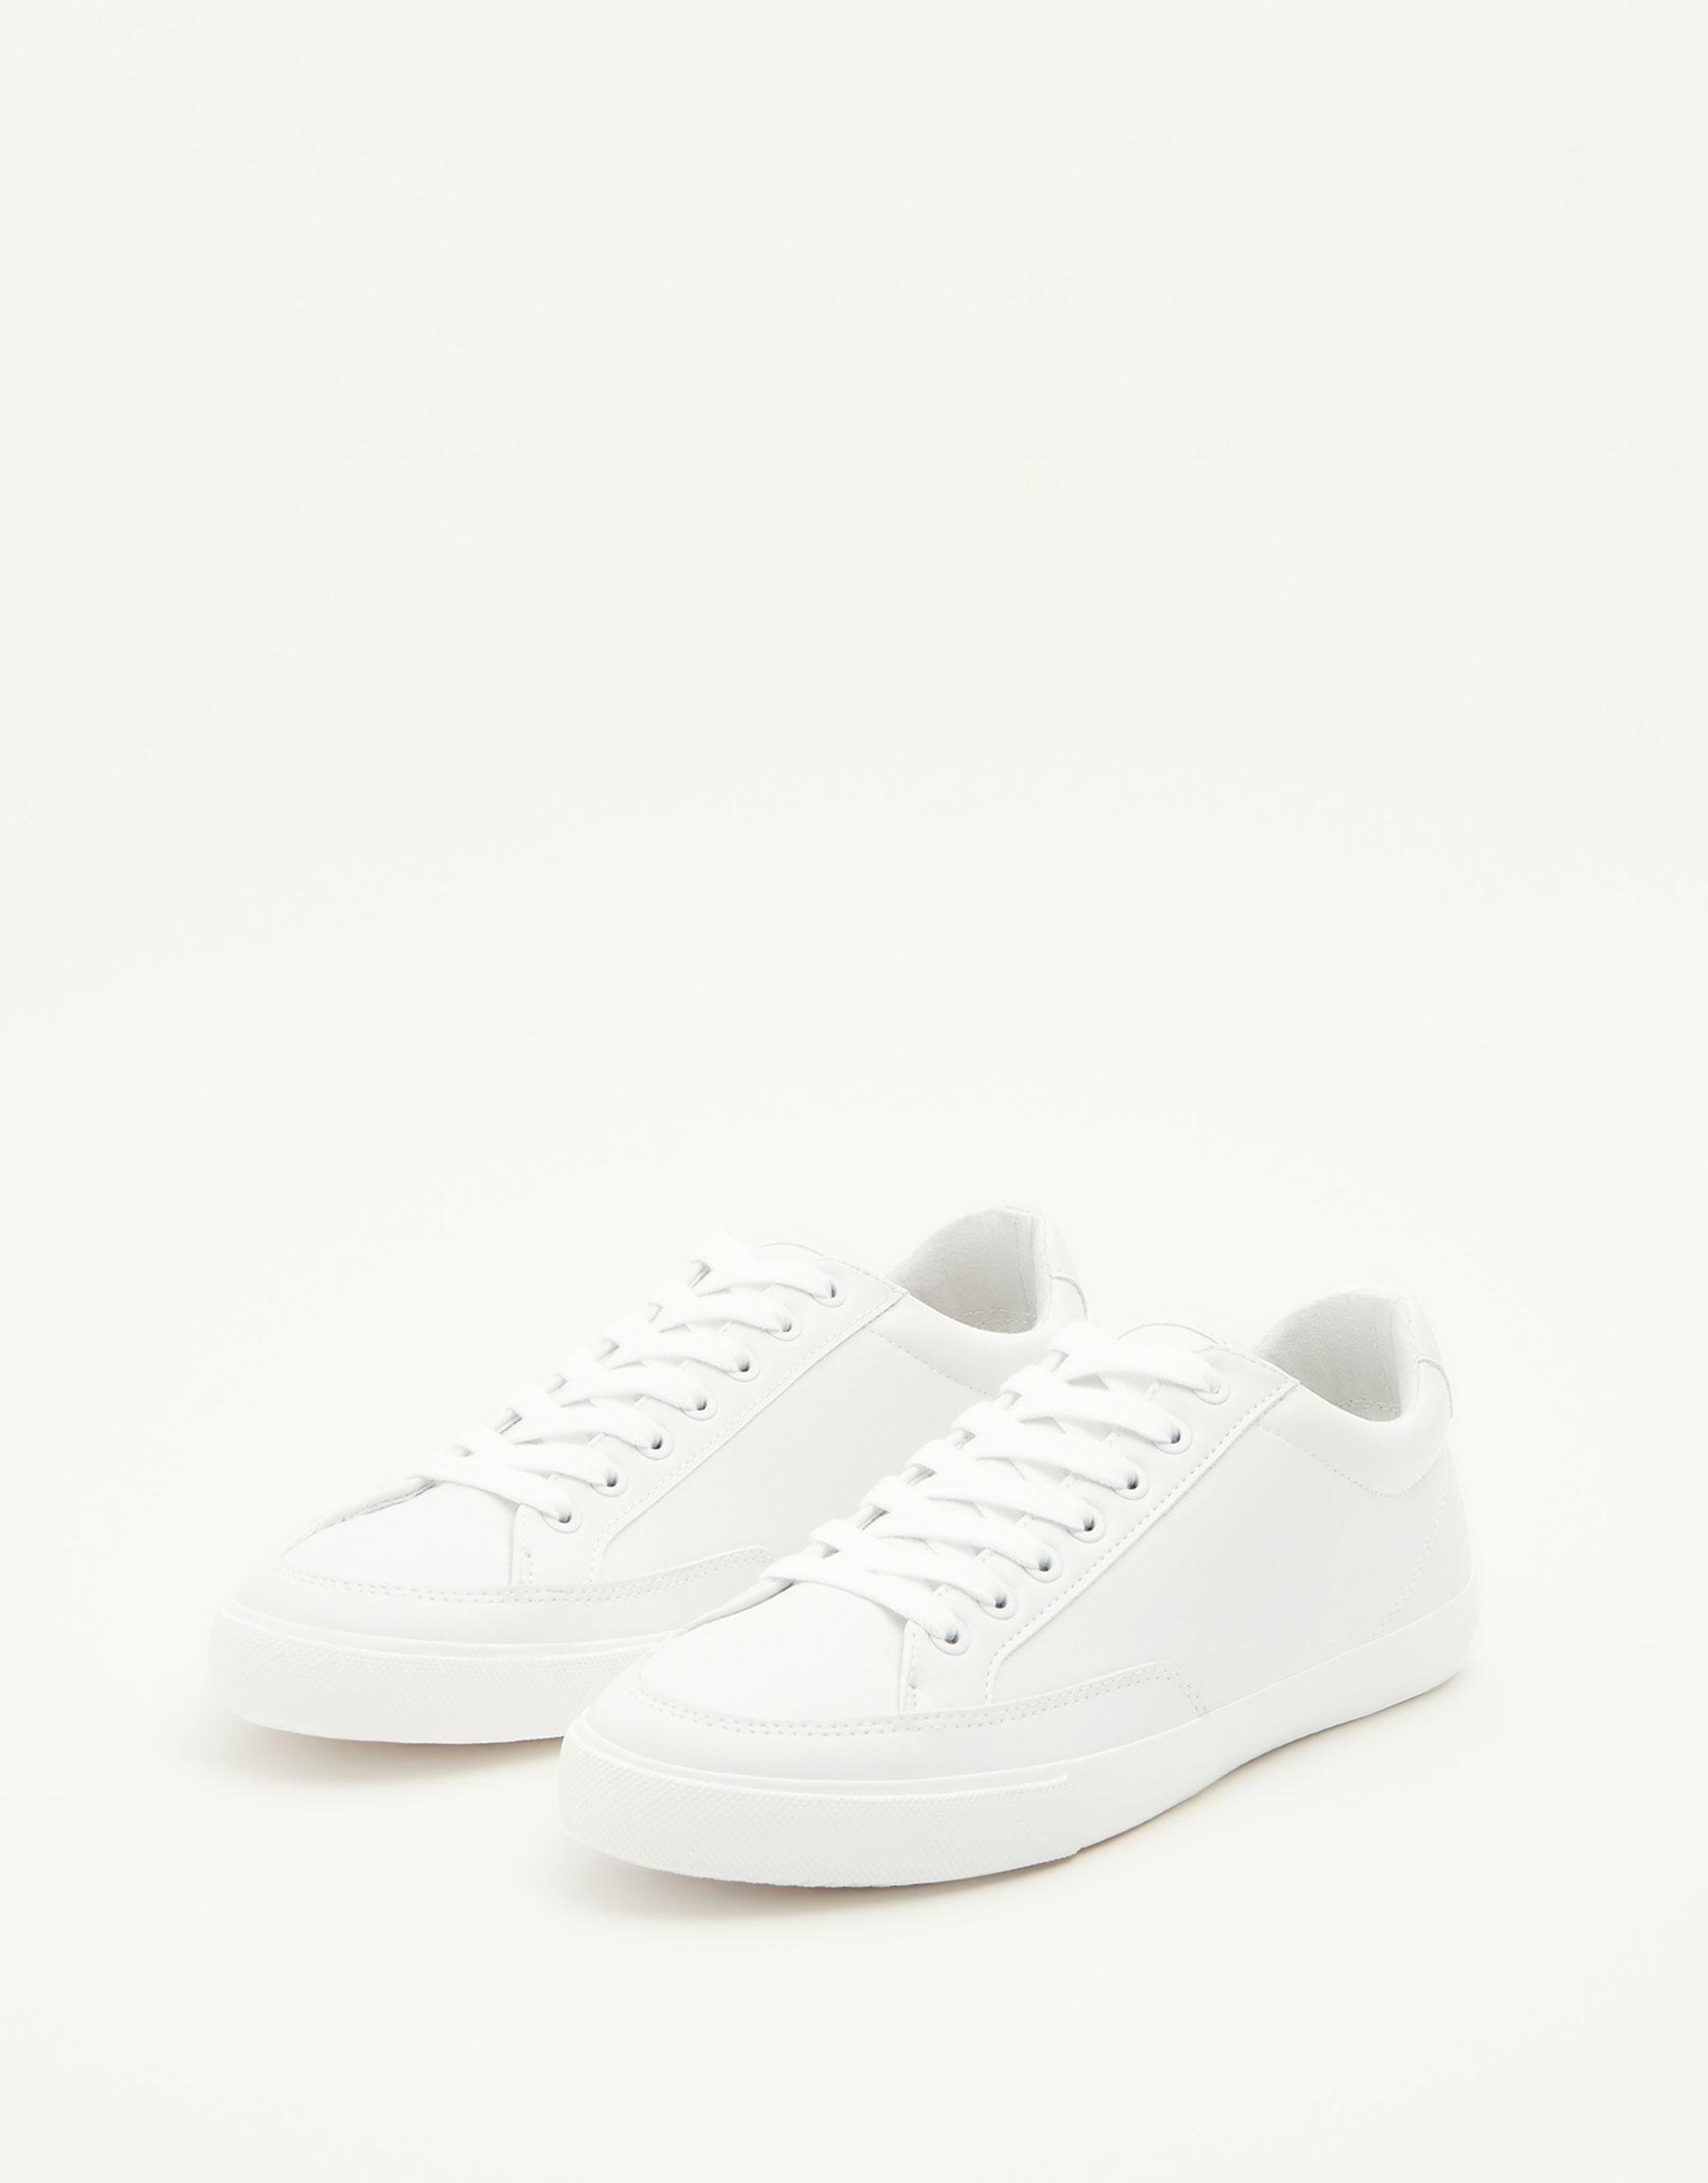 White monochrome sneakers